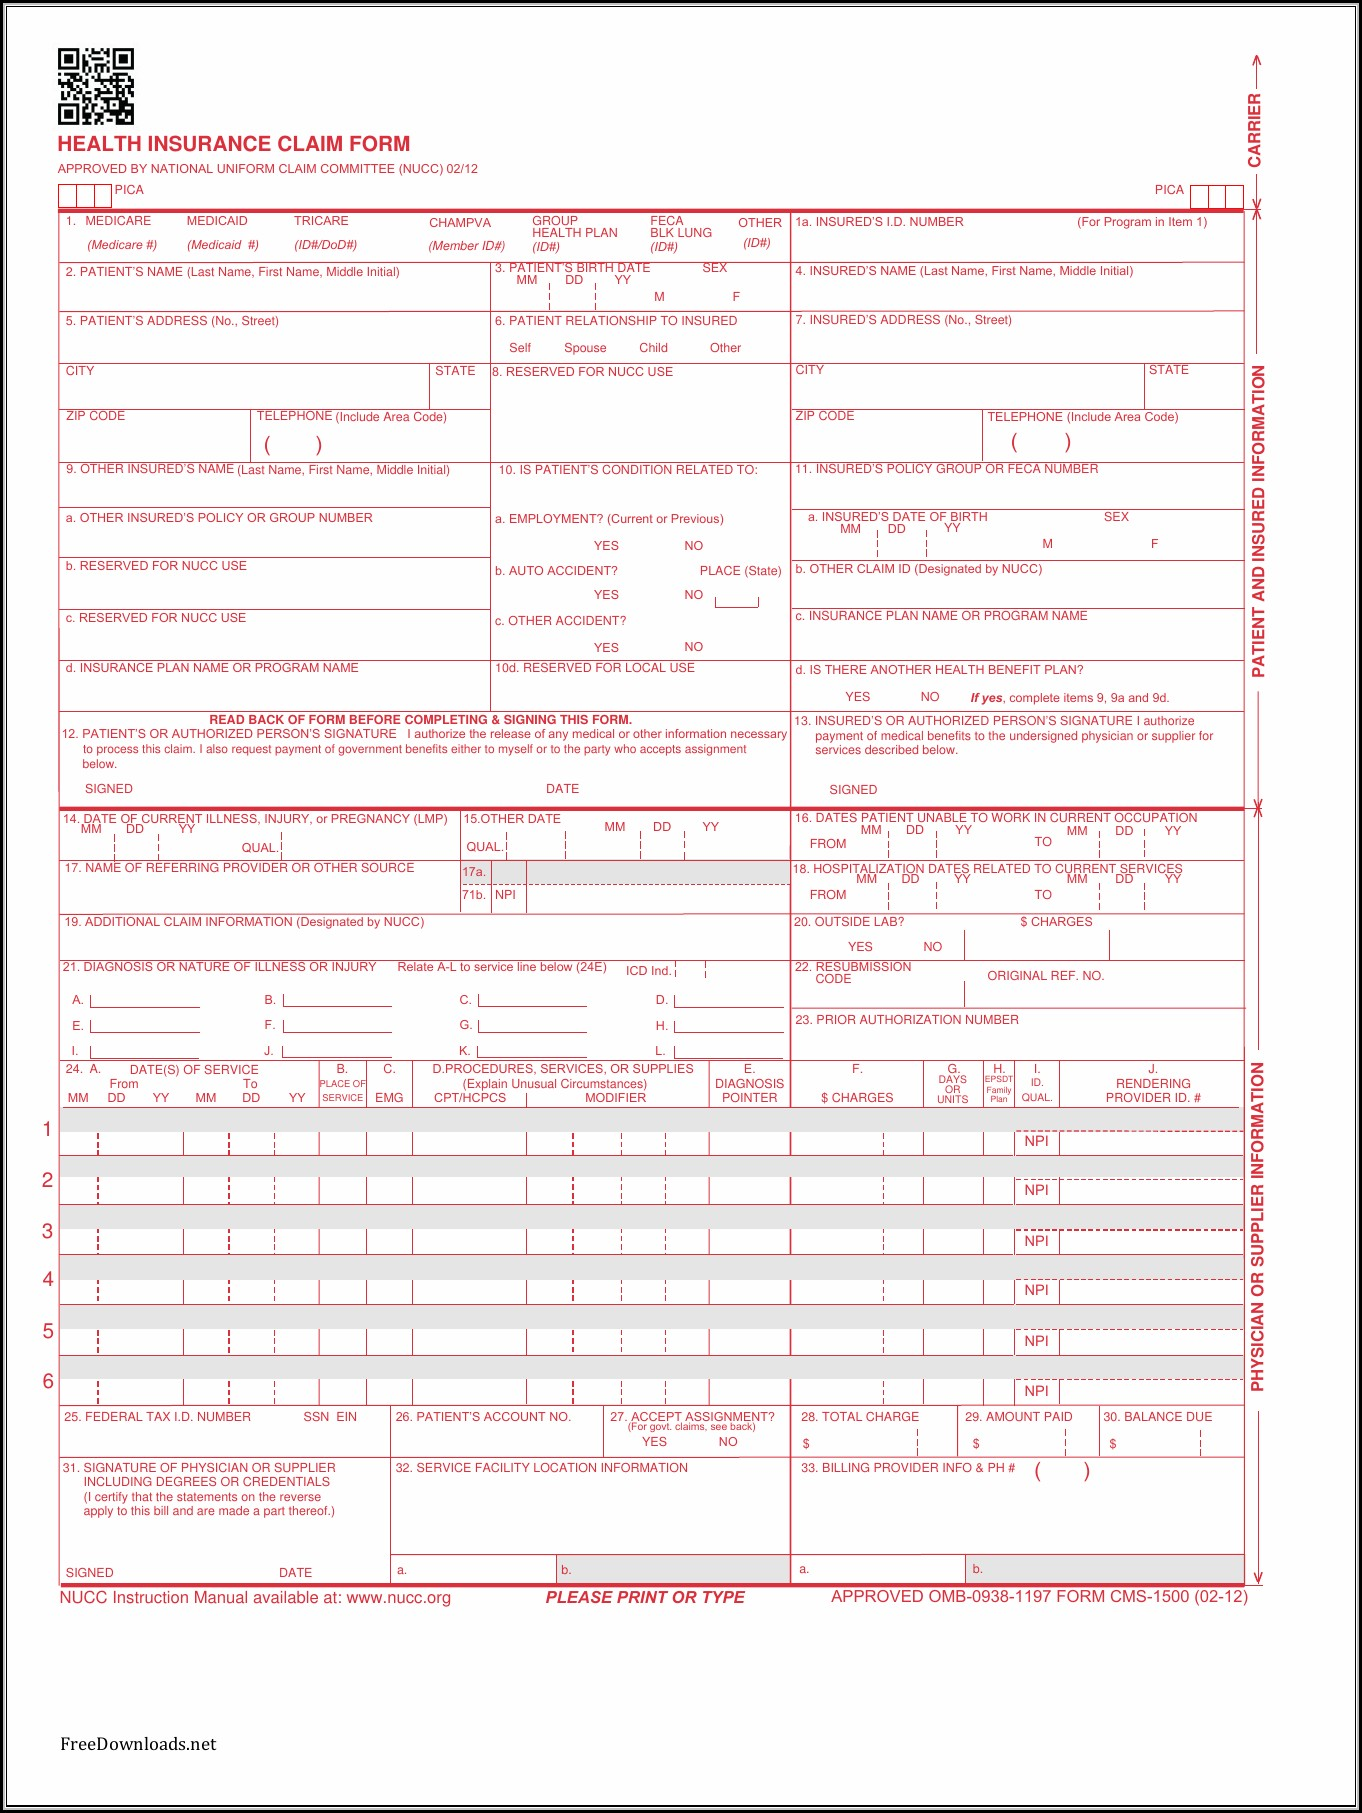 Cms 1500 Form Pdf